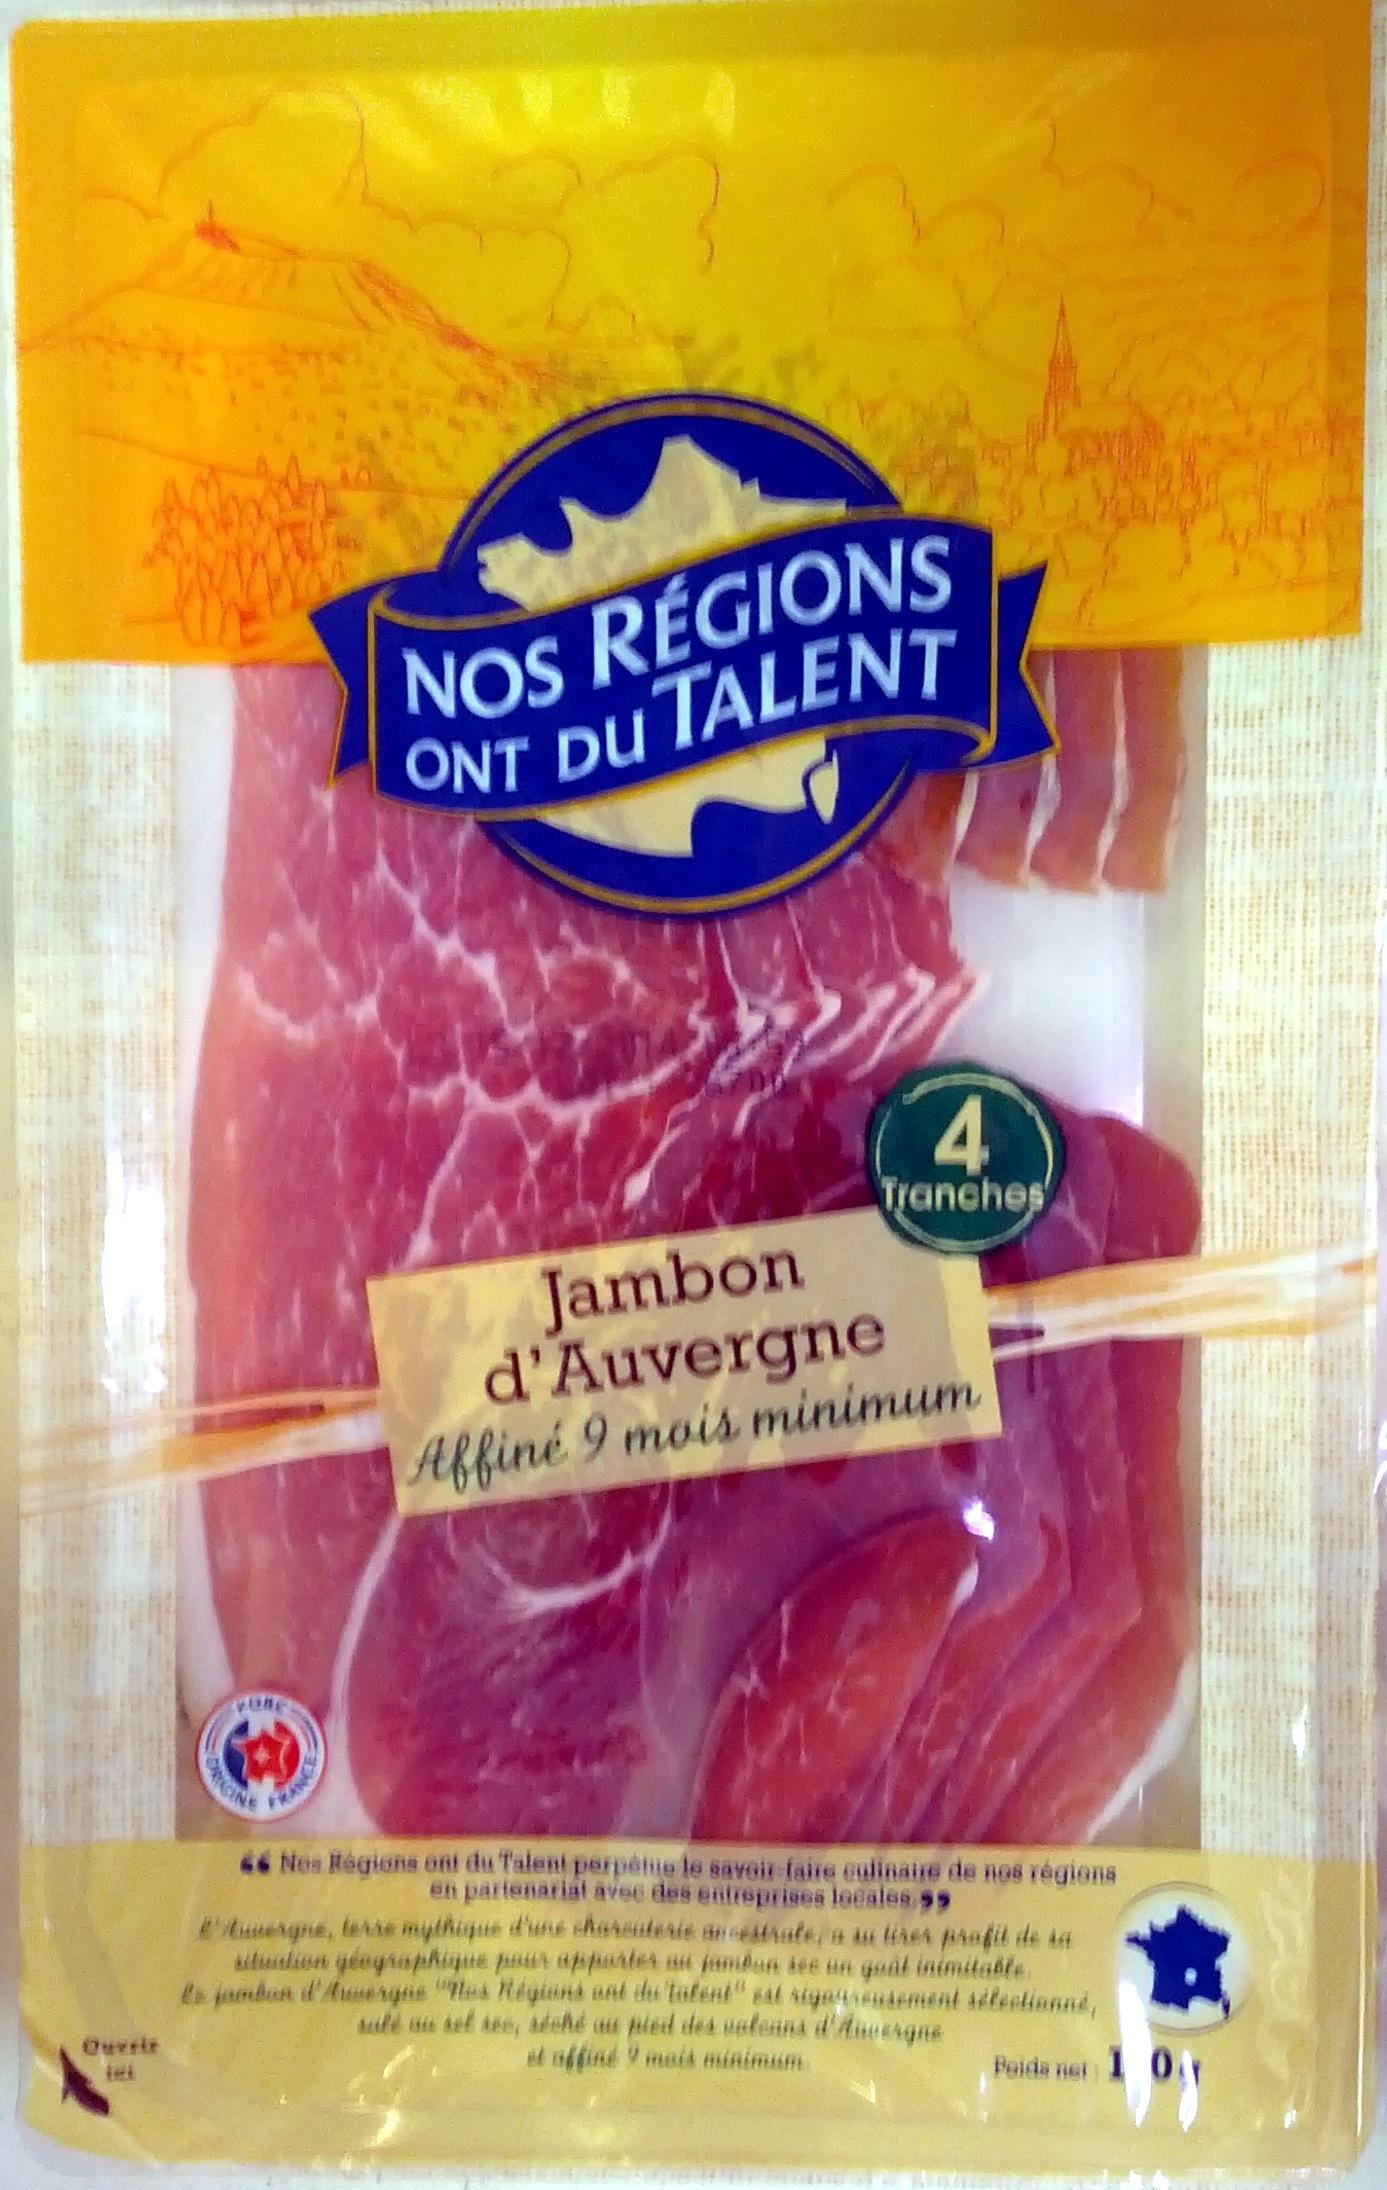 Jambon d'Auvergne (4 Tranches) - Product - fr